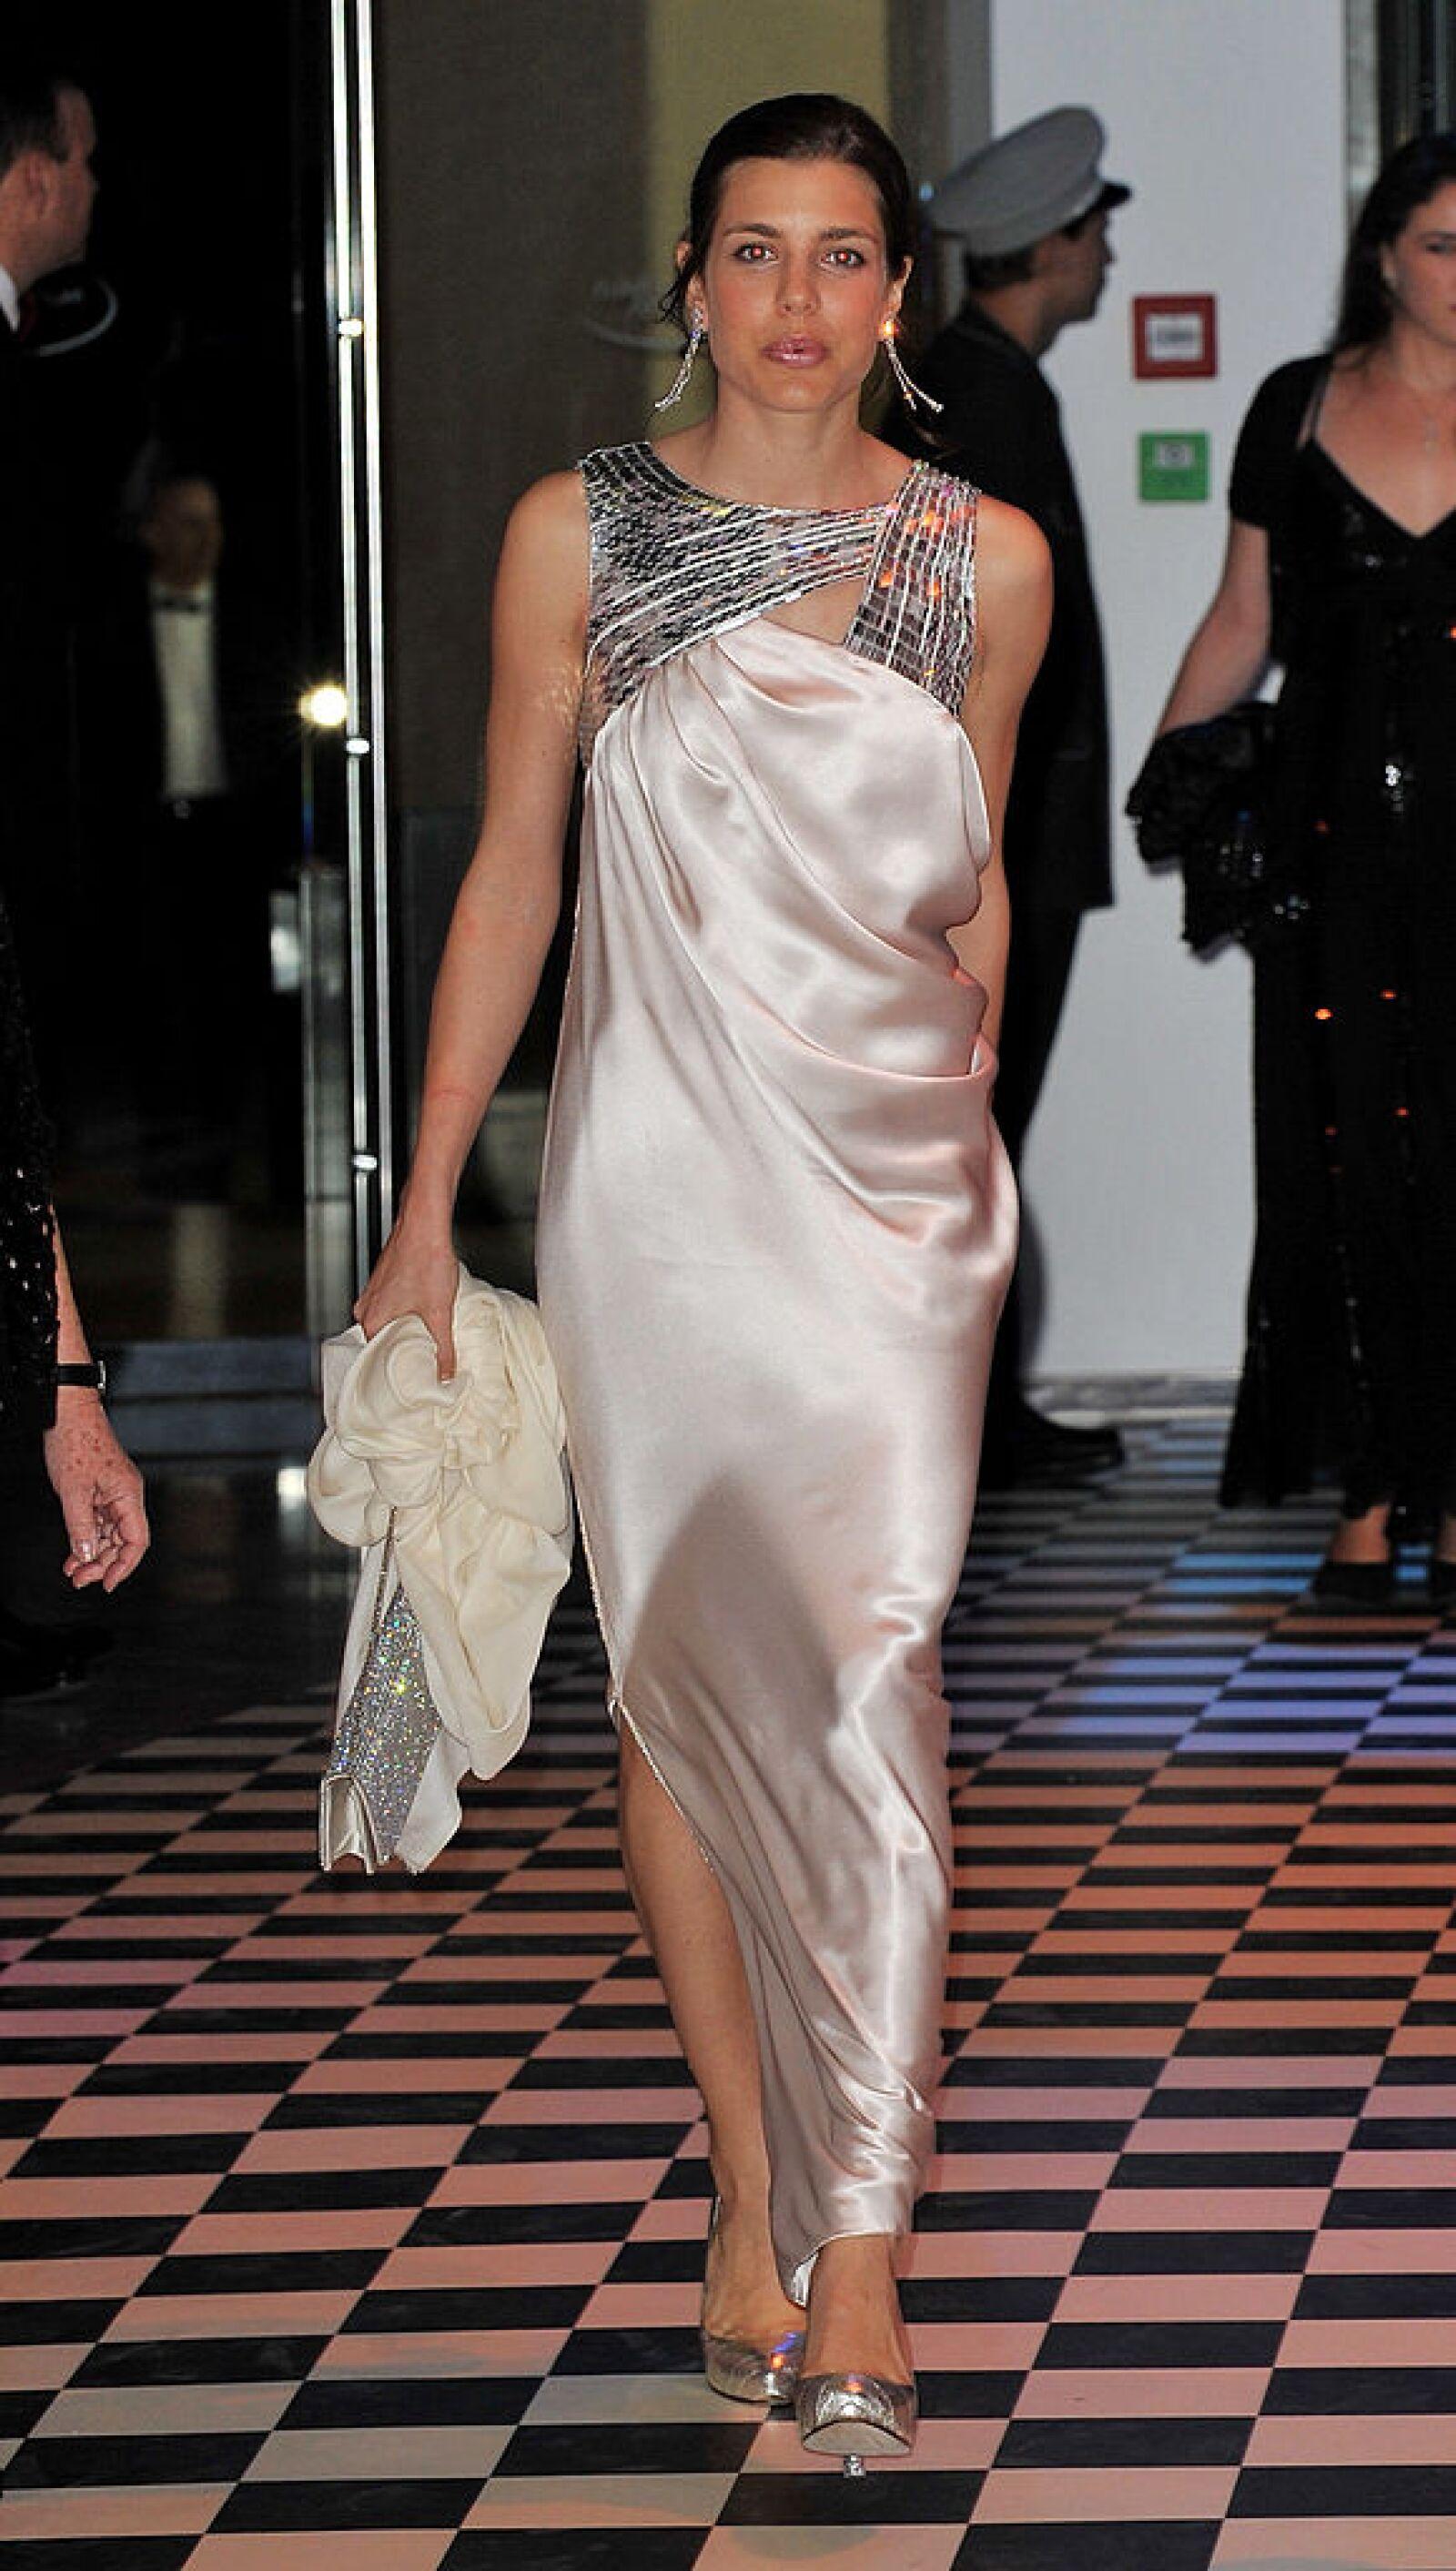 2010 Monte Carlo Rose Ball